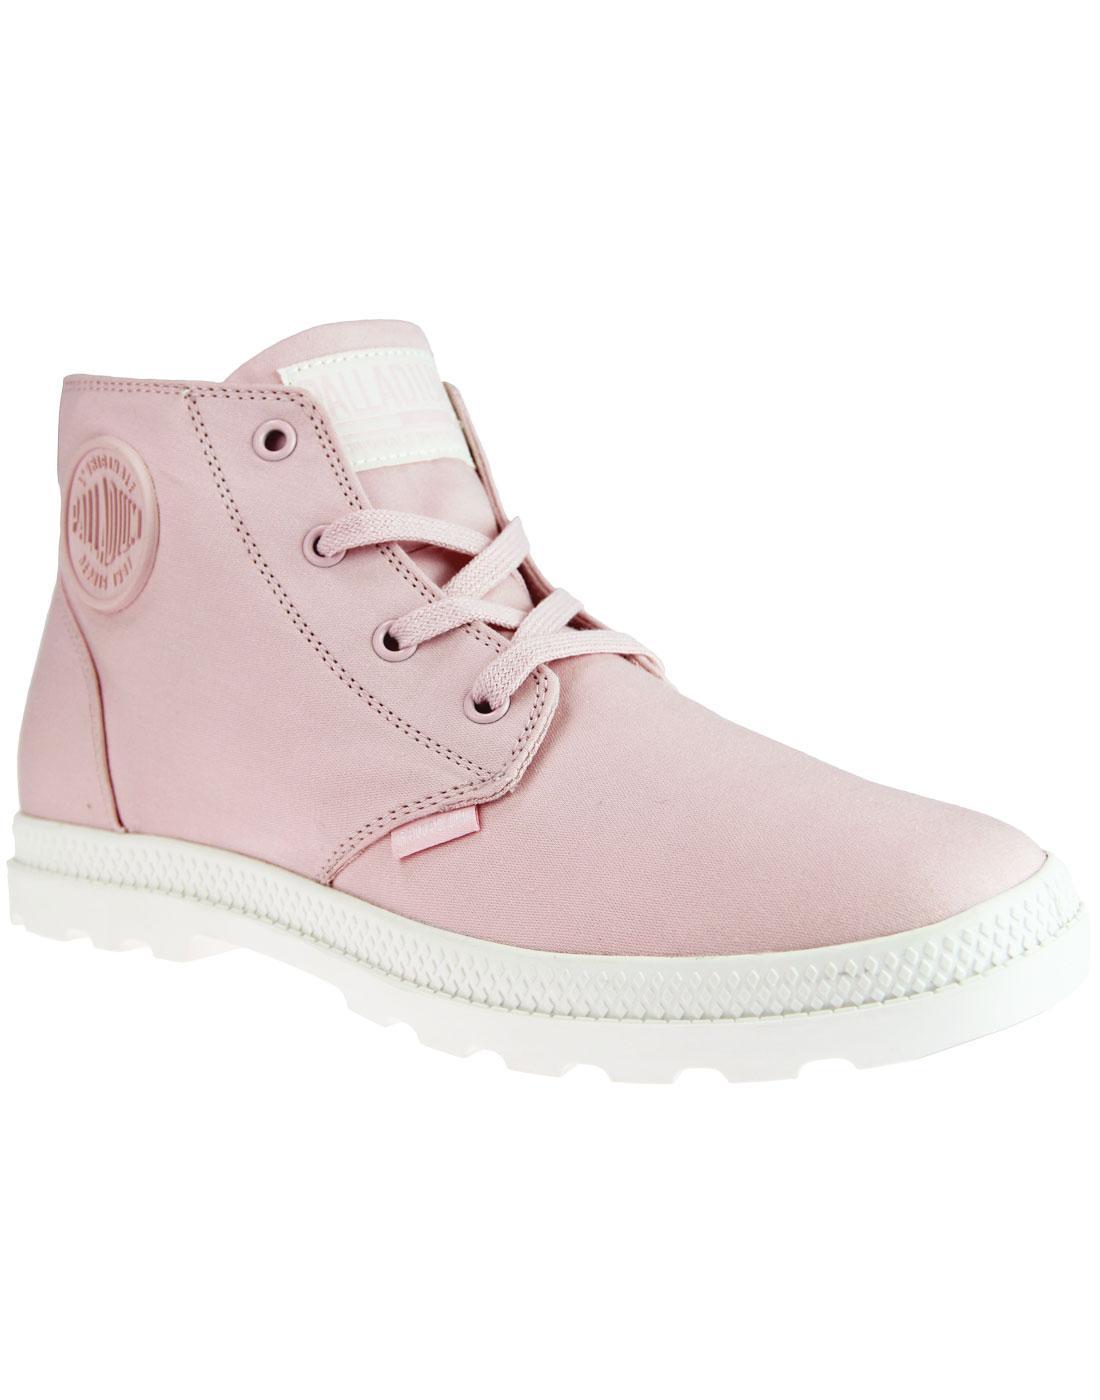 Pampa Free CVS PALLADIUM Women's Retro Boots LOTUS